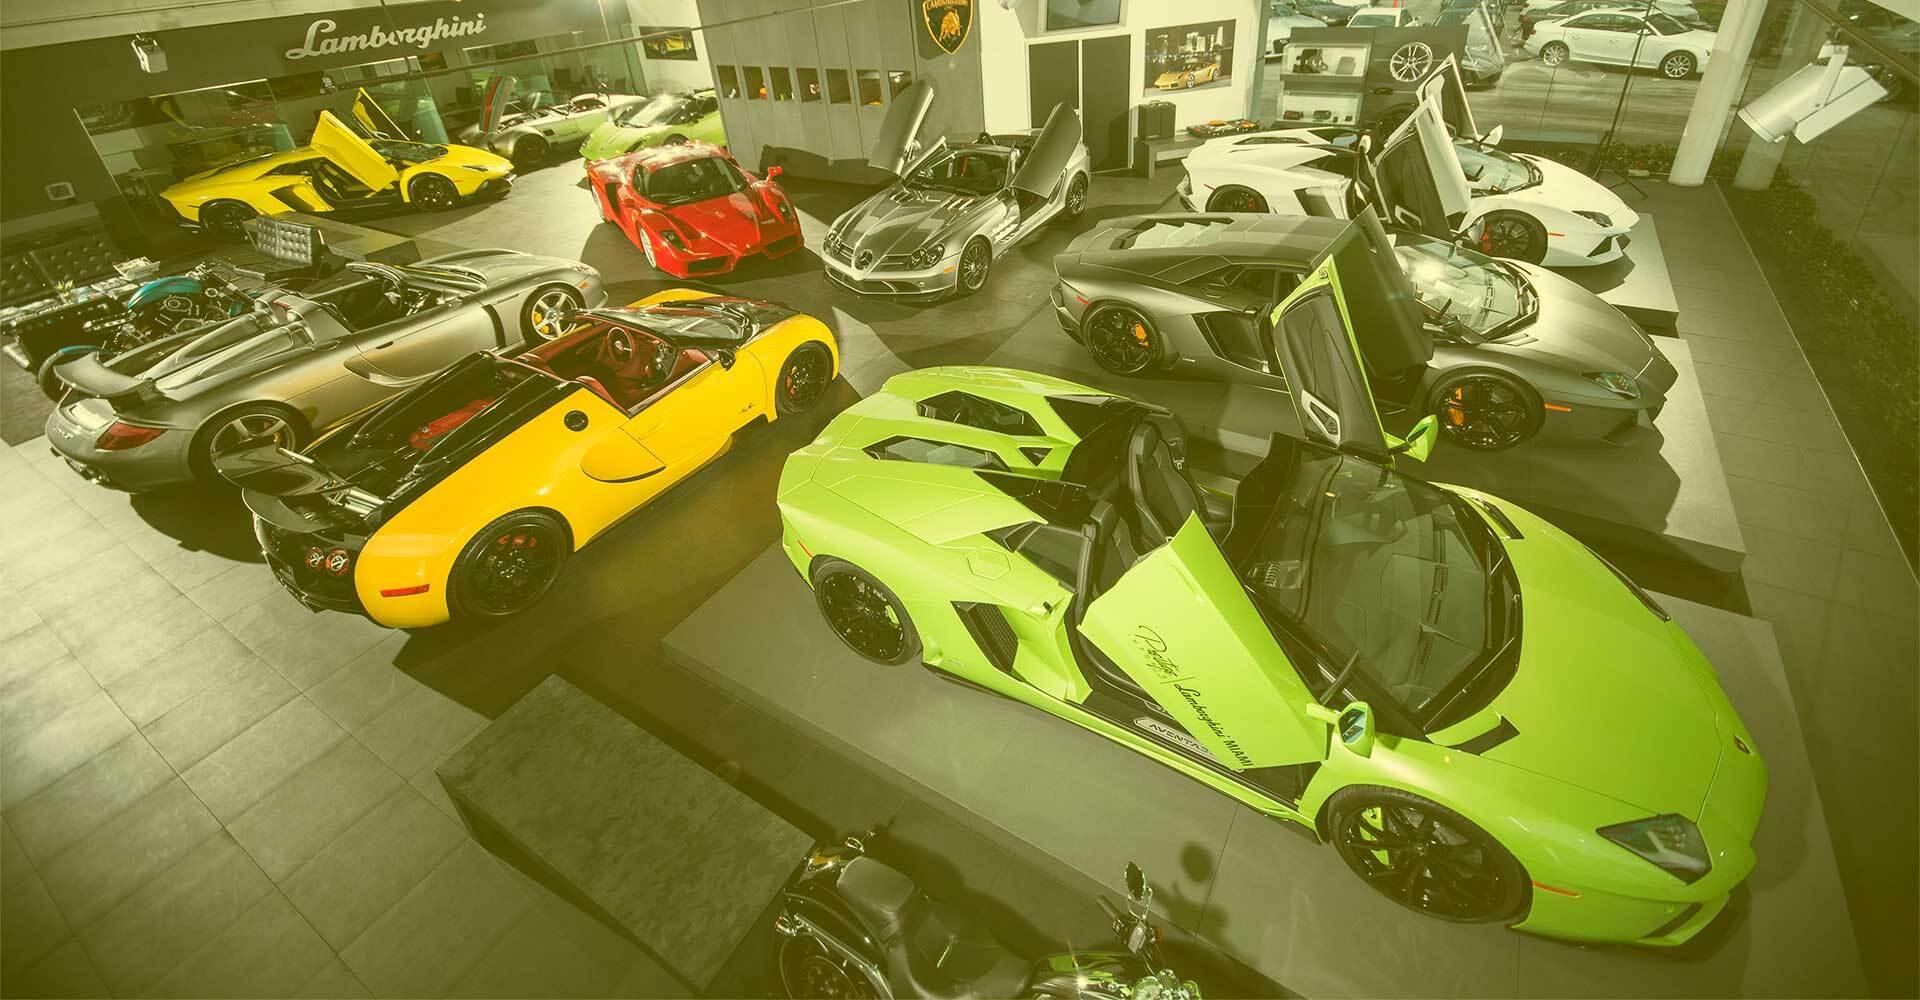 north sale fl schedule drive dealership for miami used florida test cars in lamborghini testdrive beach